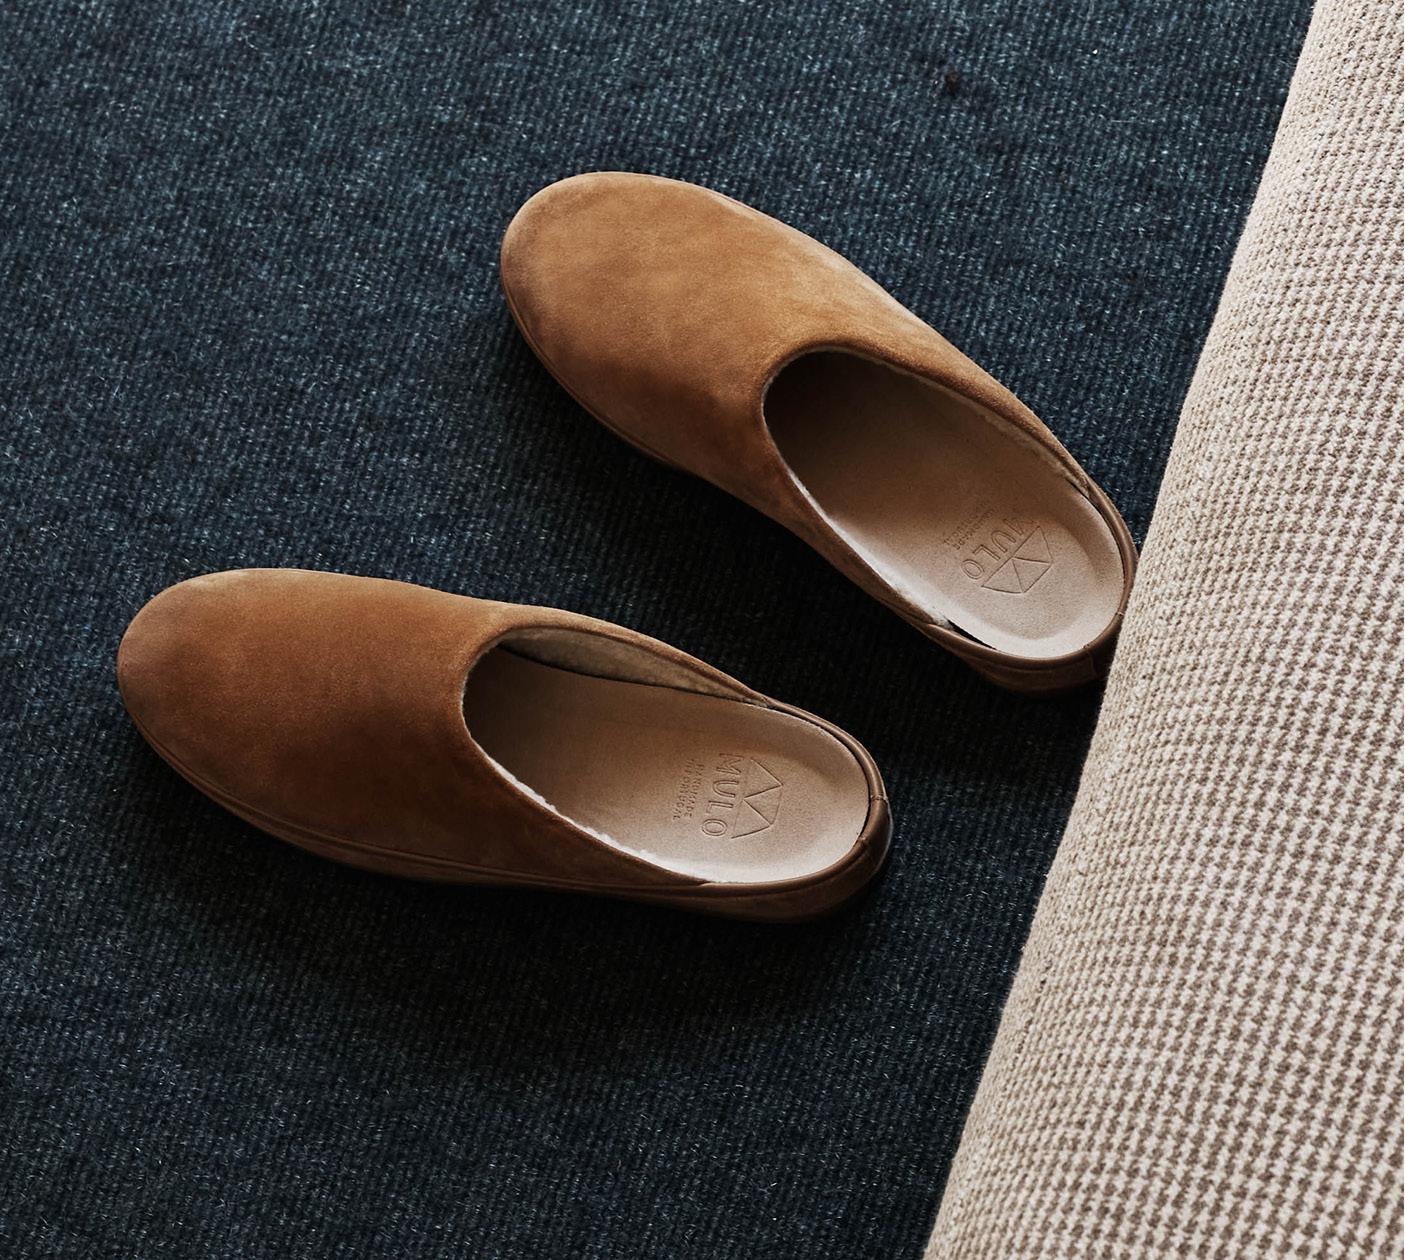 New Mens Slippers - Chestnut Suede Sheepskin Slippers